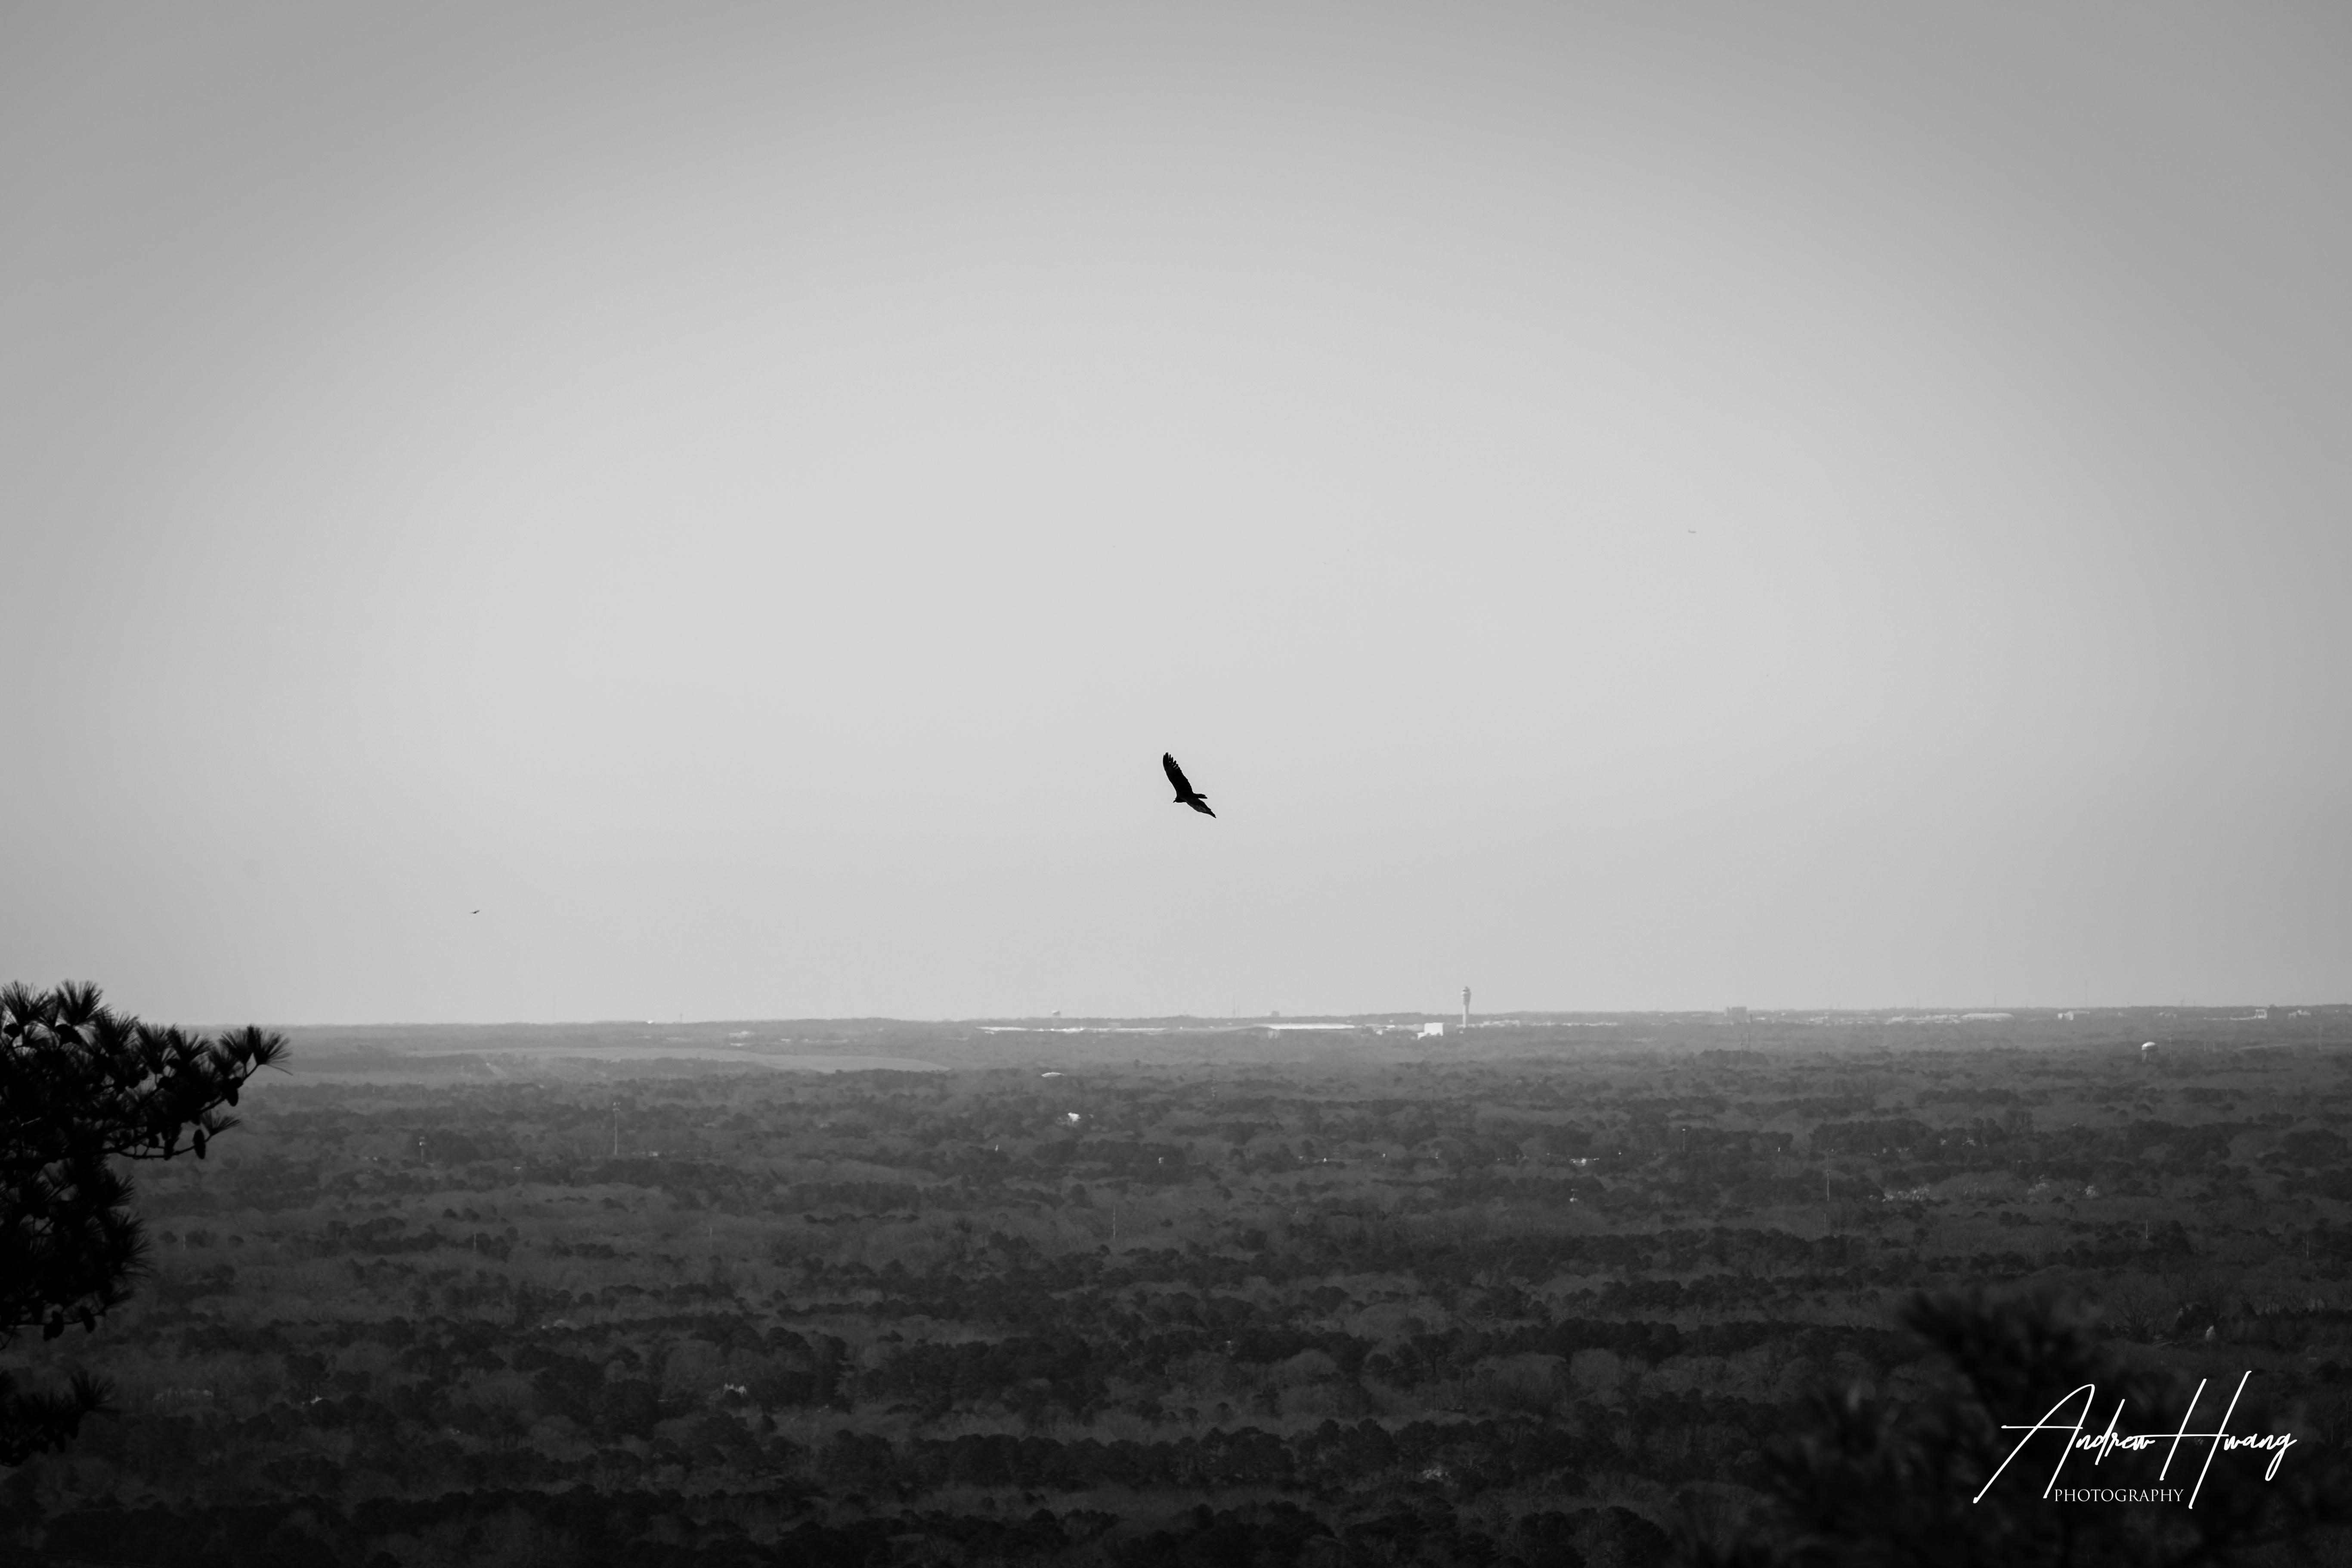 Stone Mountain - Hawks Circling